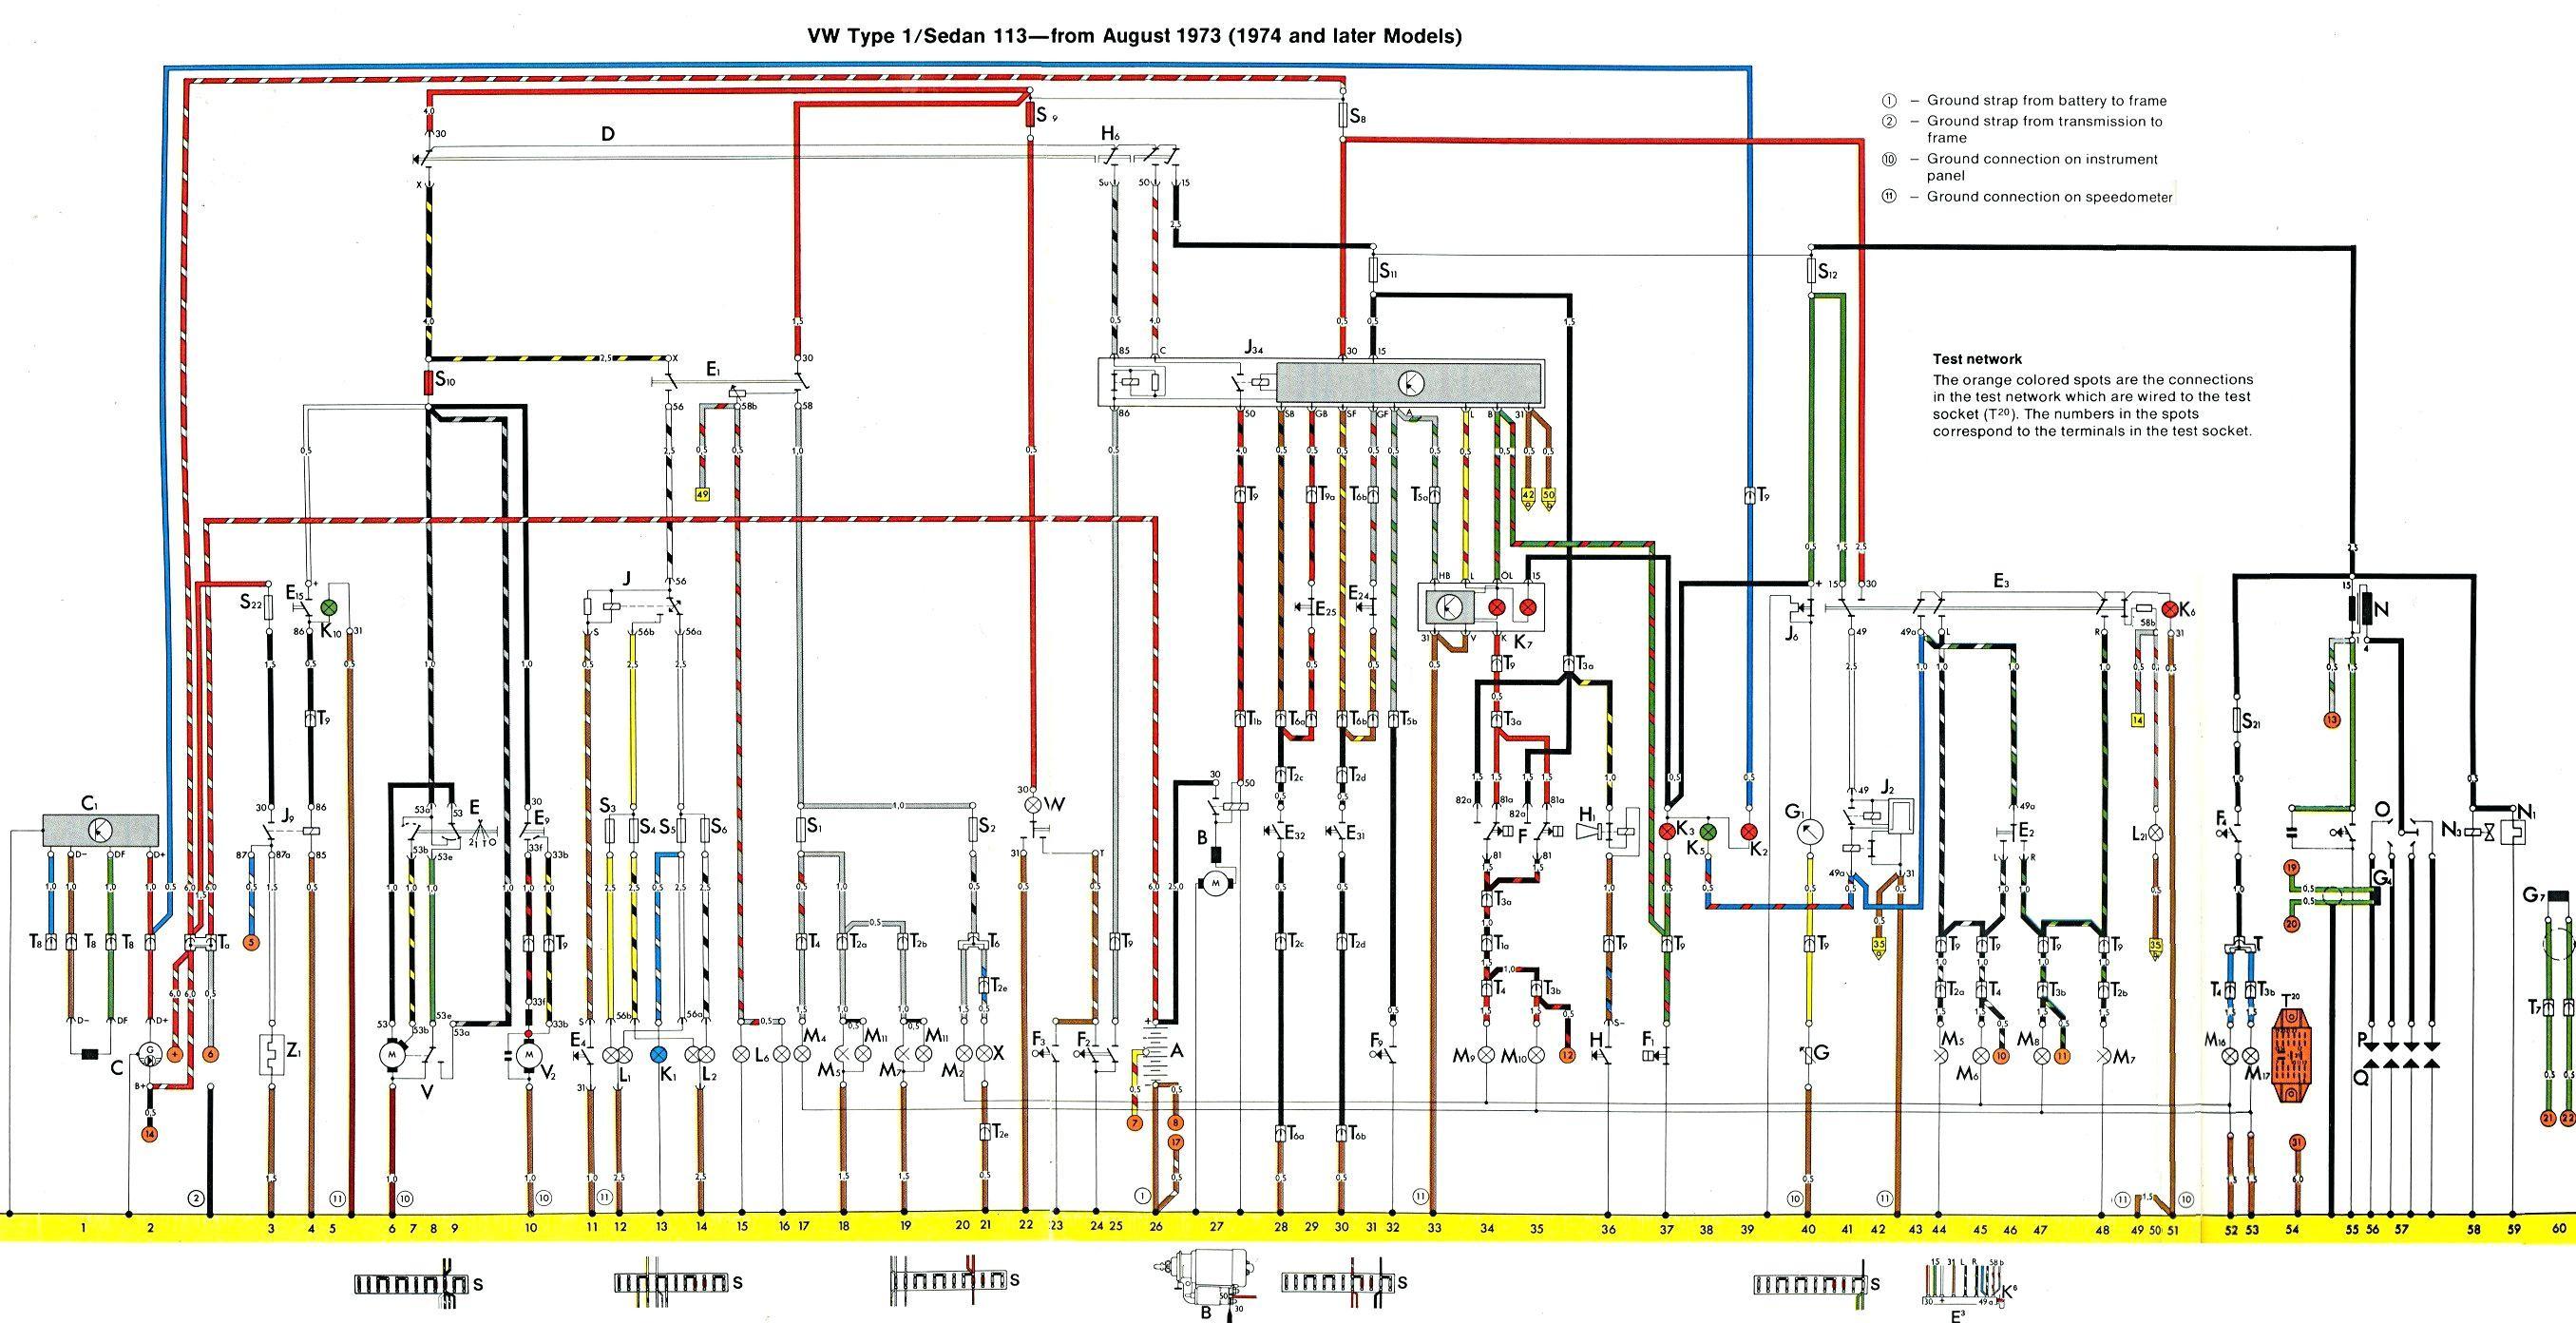 2001 Vw Beetle Wiring - Wiring Diagram Split Vw Bug Wiring Harness on vw bug steering coupler, vw bug speaker, vw bug thermostat, vw bug intercooler, vw bug ignition system, vw bug wiring kit, vw bug charging system, vw bug spark plugs, vw bug solenoid, vw bug exhaust gasket, vw bug throttle cable, vw bug serpentine belt, vw bug oil temp sensor, vw wiring harness kits, vw bug lights, vw bug electrical, vw beetle wiring, vw bug intake, vw bug flasher relay, vw trike wiring harness,